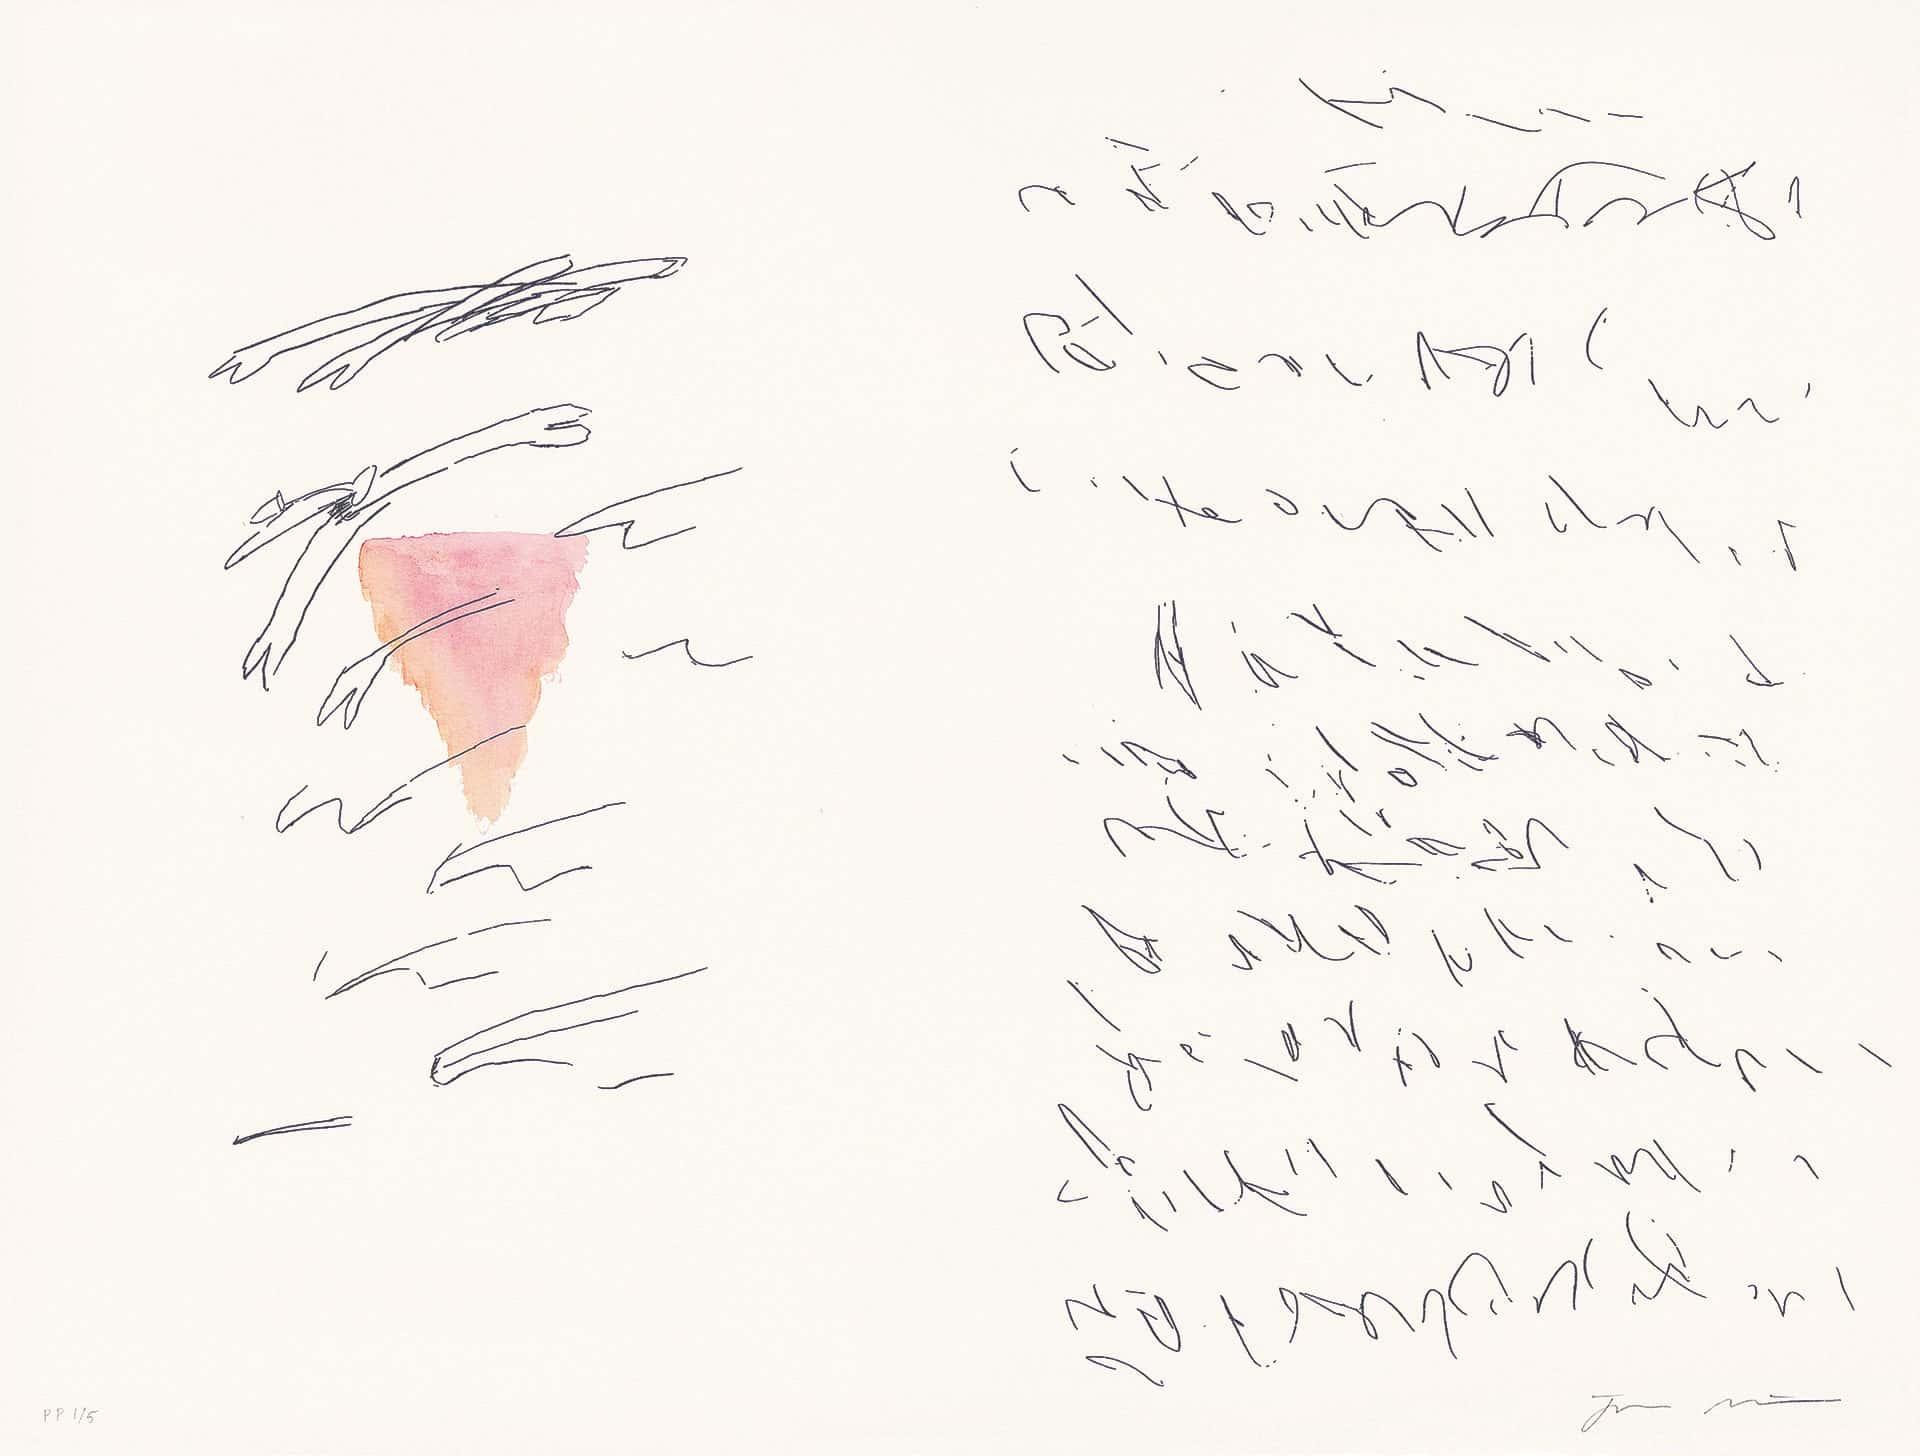 Sappho-Strophe-1.color.jpg